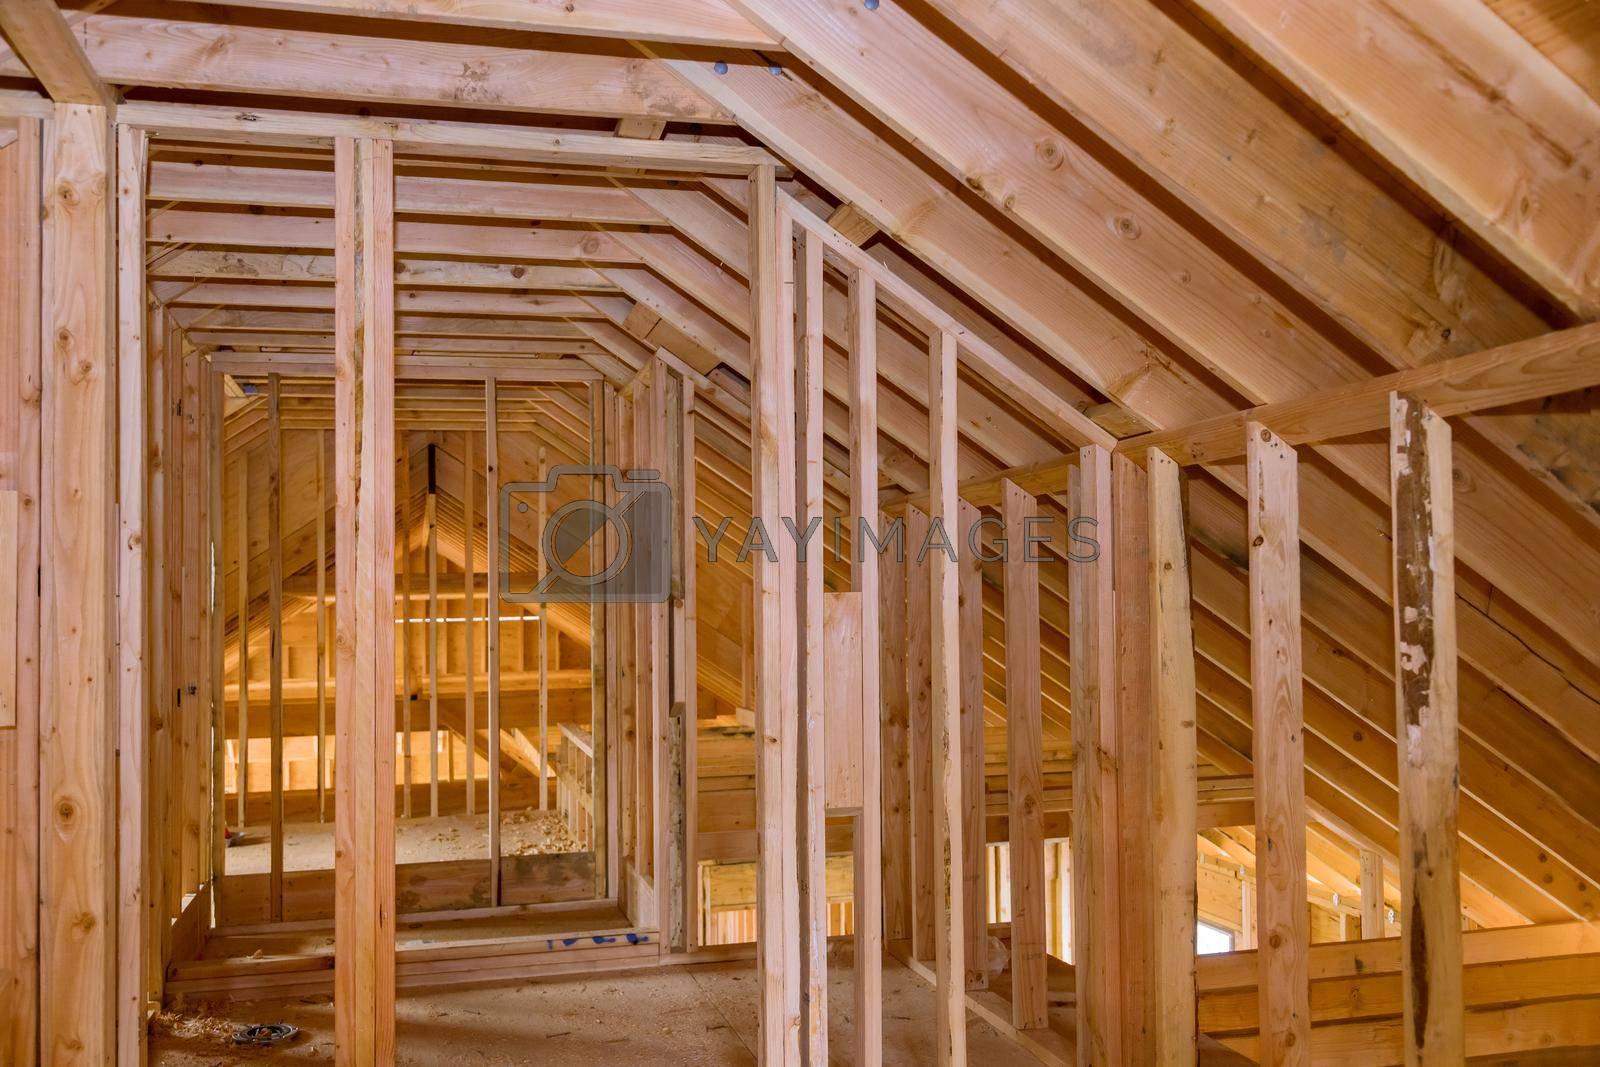 Wood framework of home residential beam under construction in progress